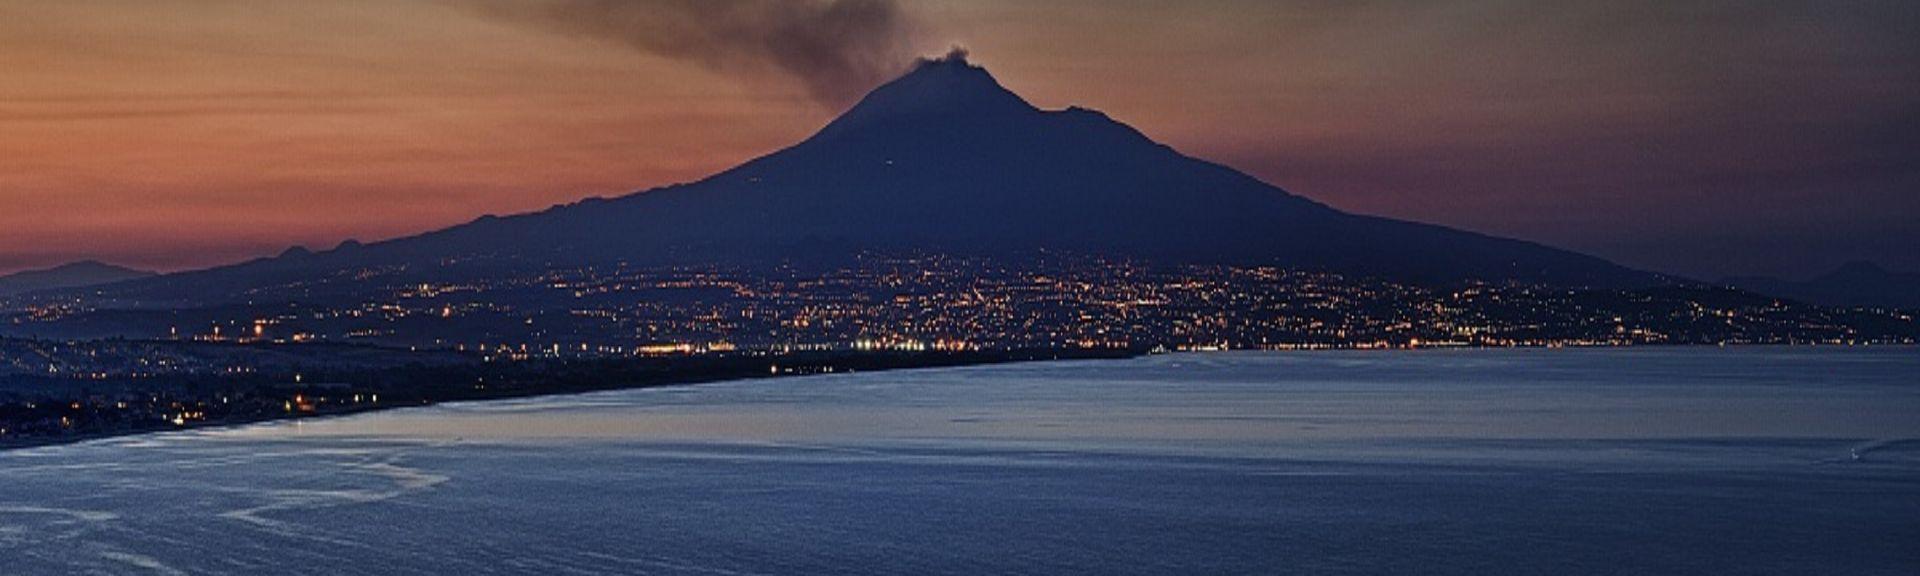 Praino, Catania, Sicily, Italy